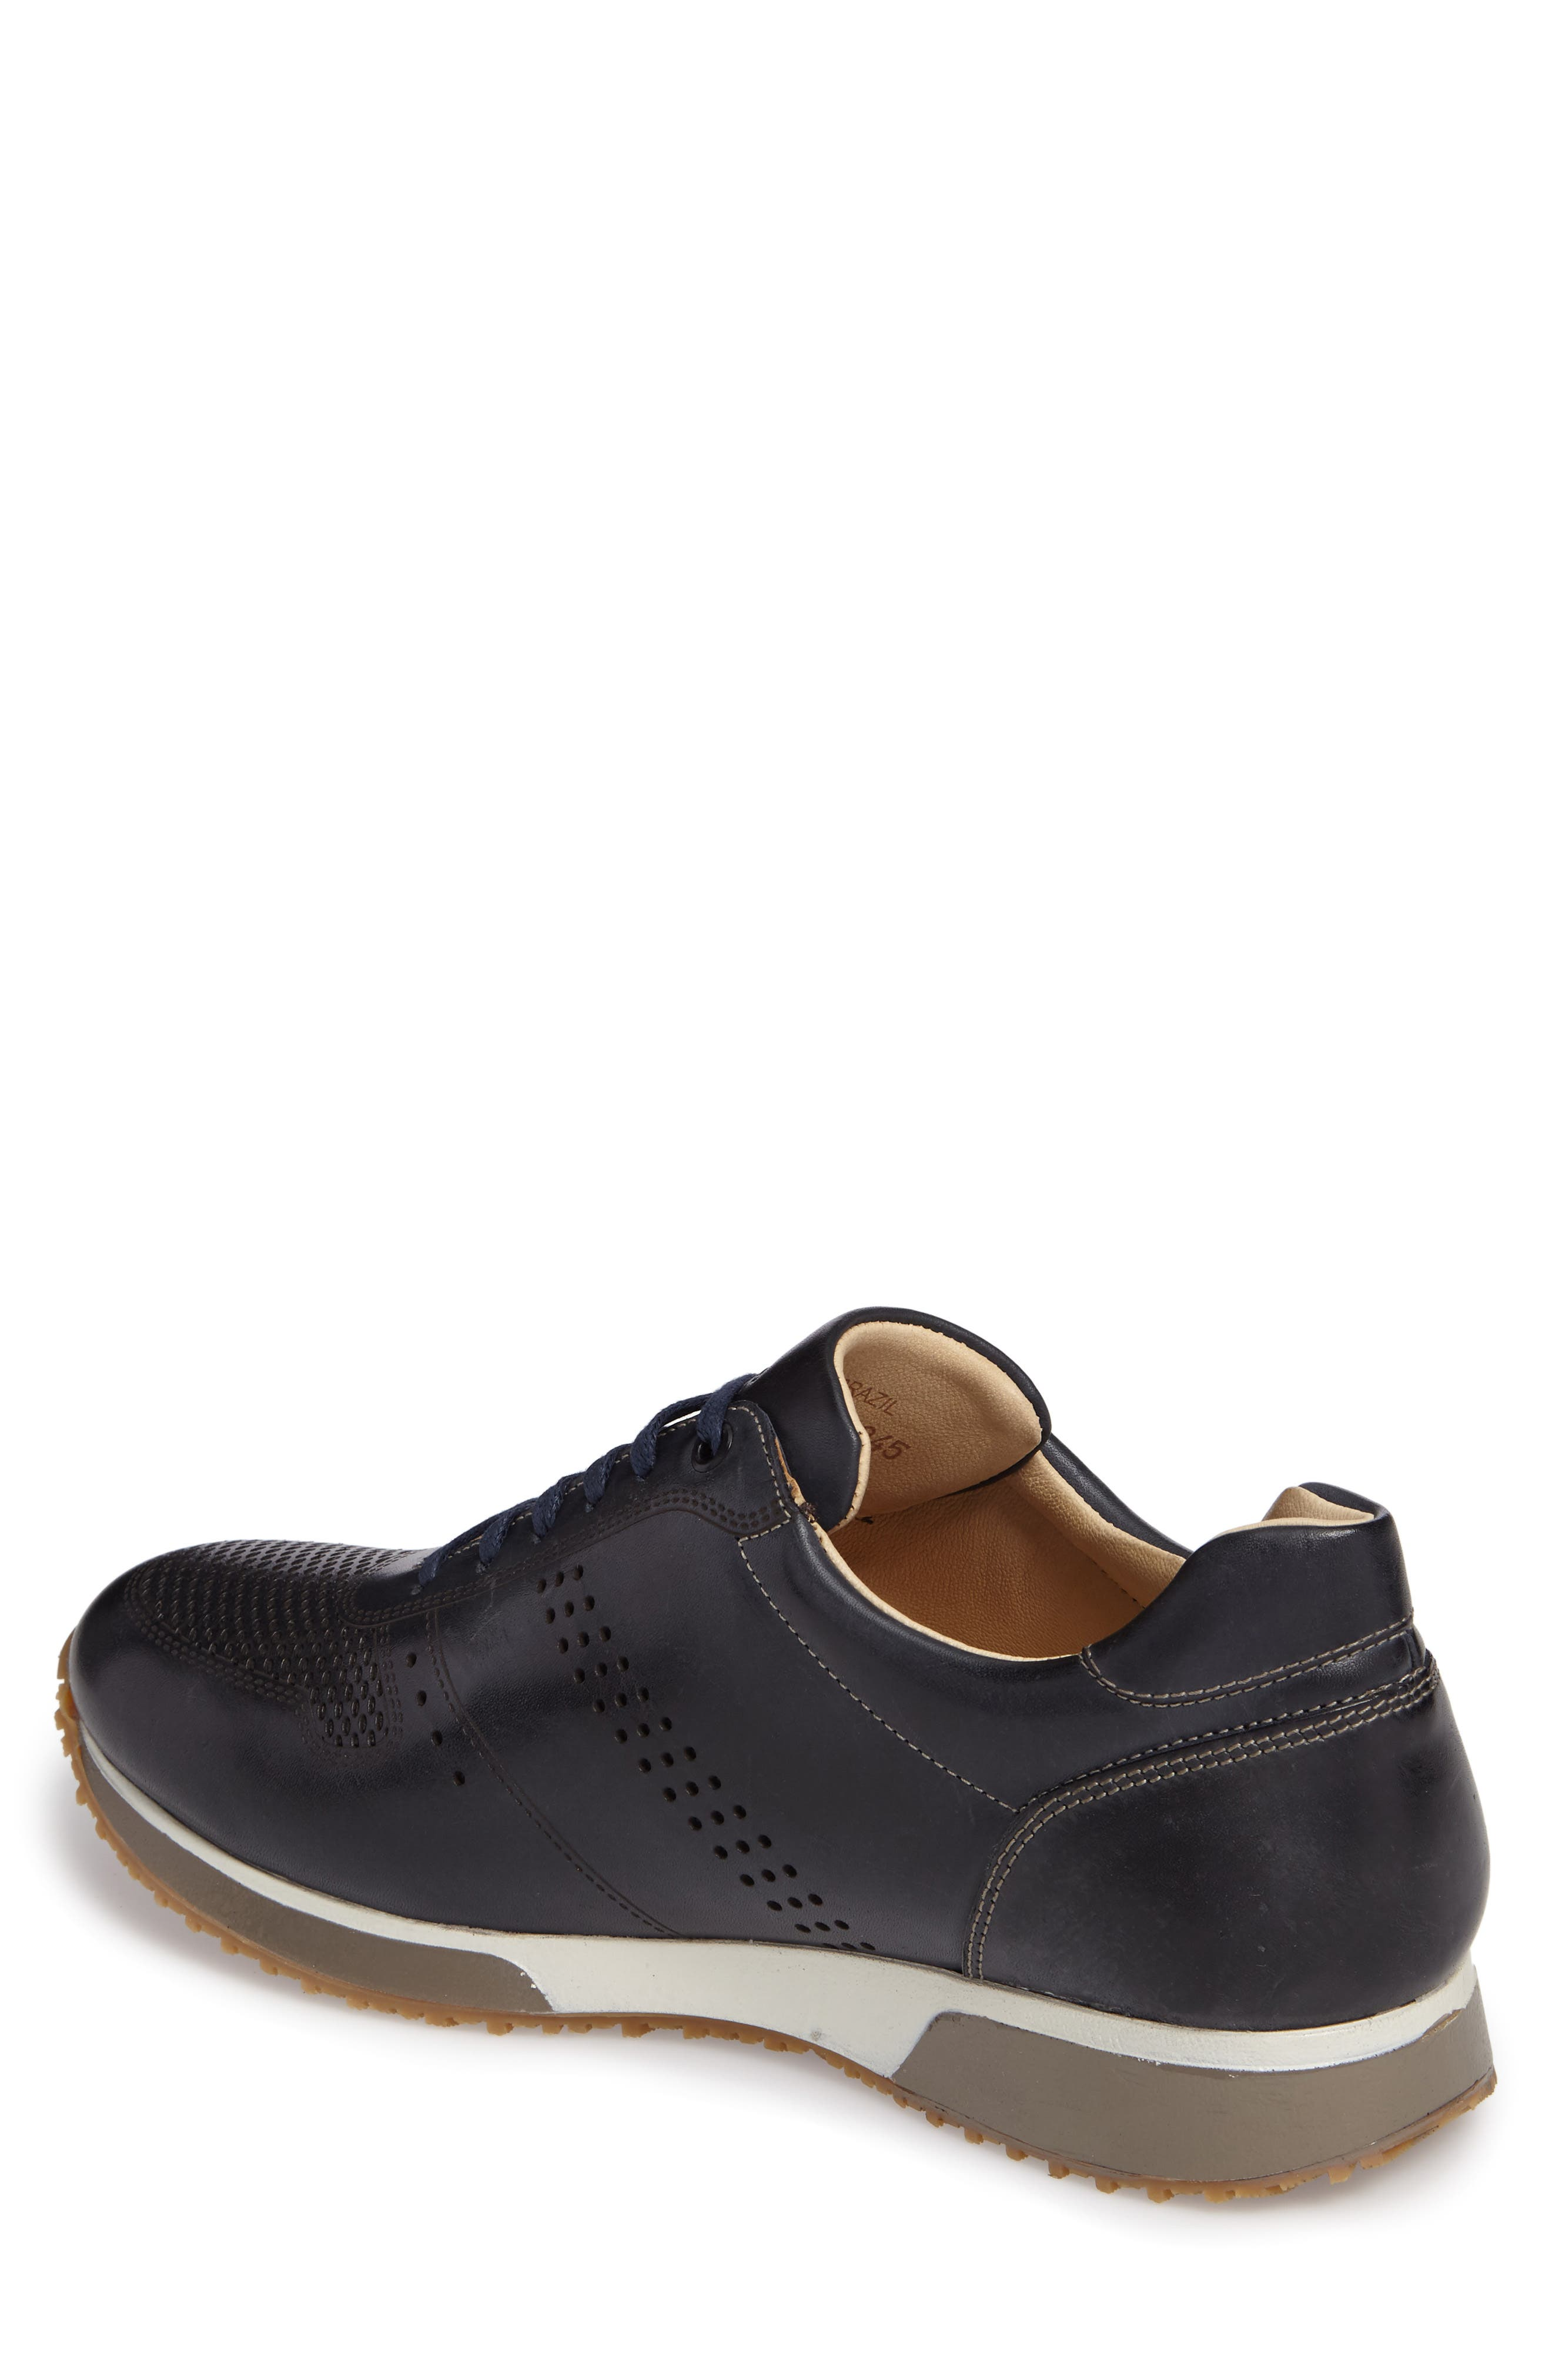 Classico Sneaker,                             Alternate thumbnail 4, color,